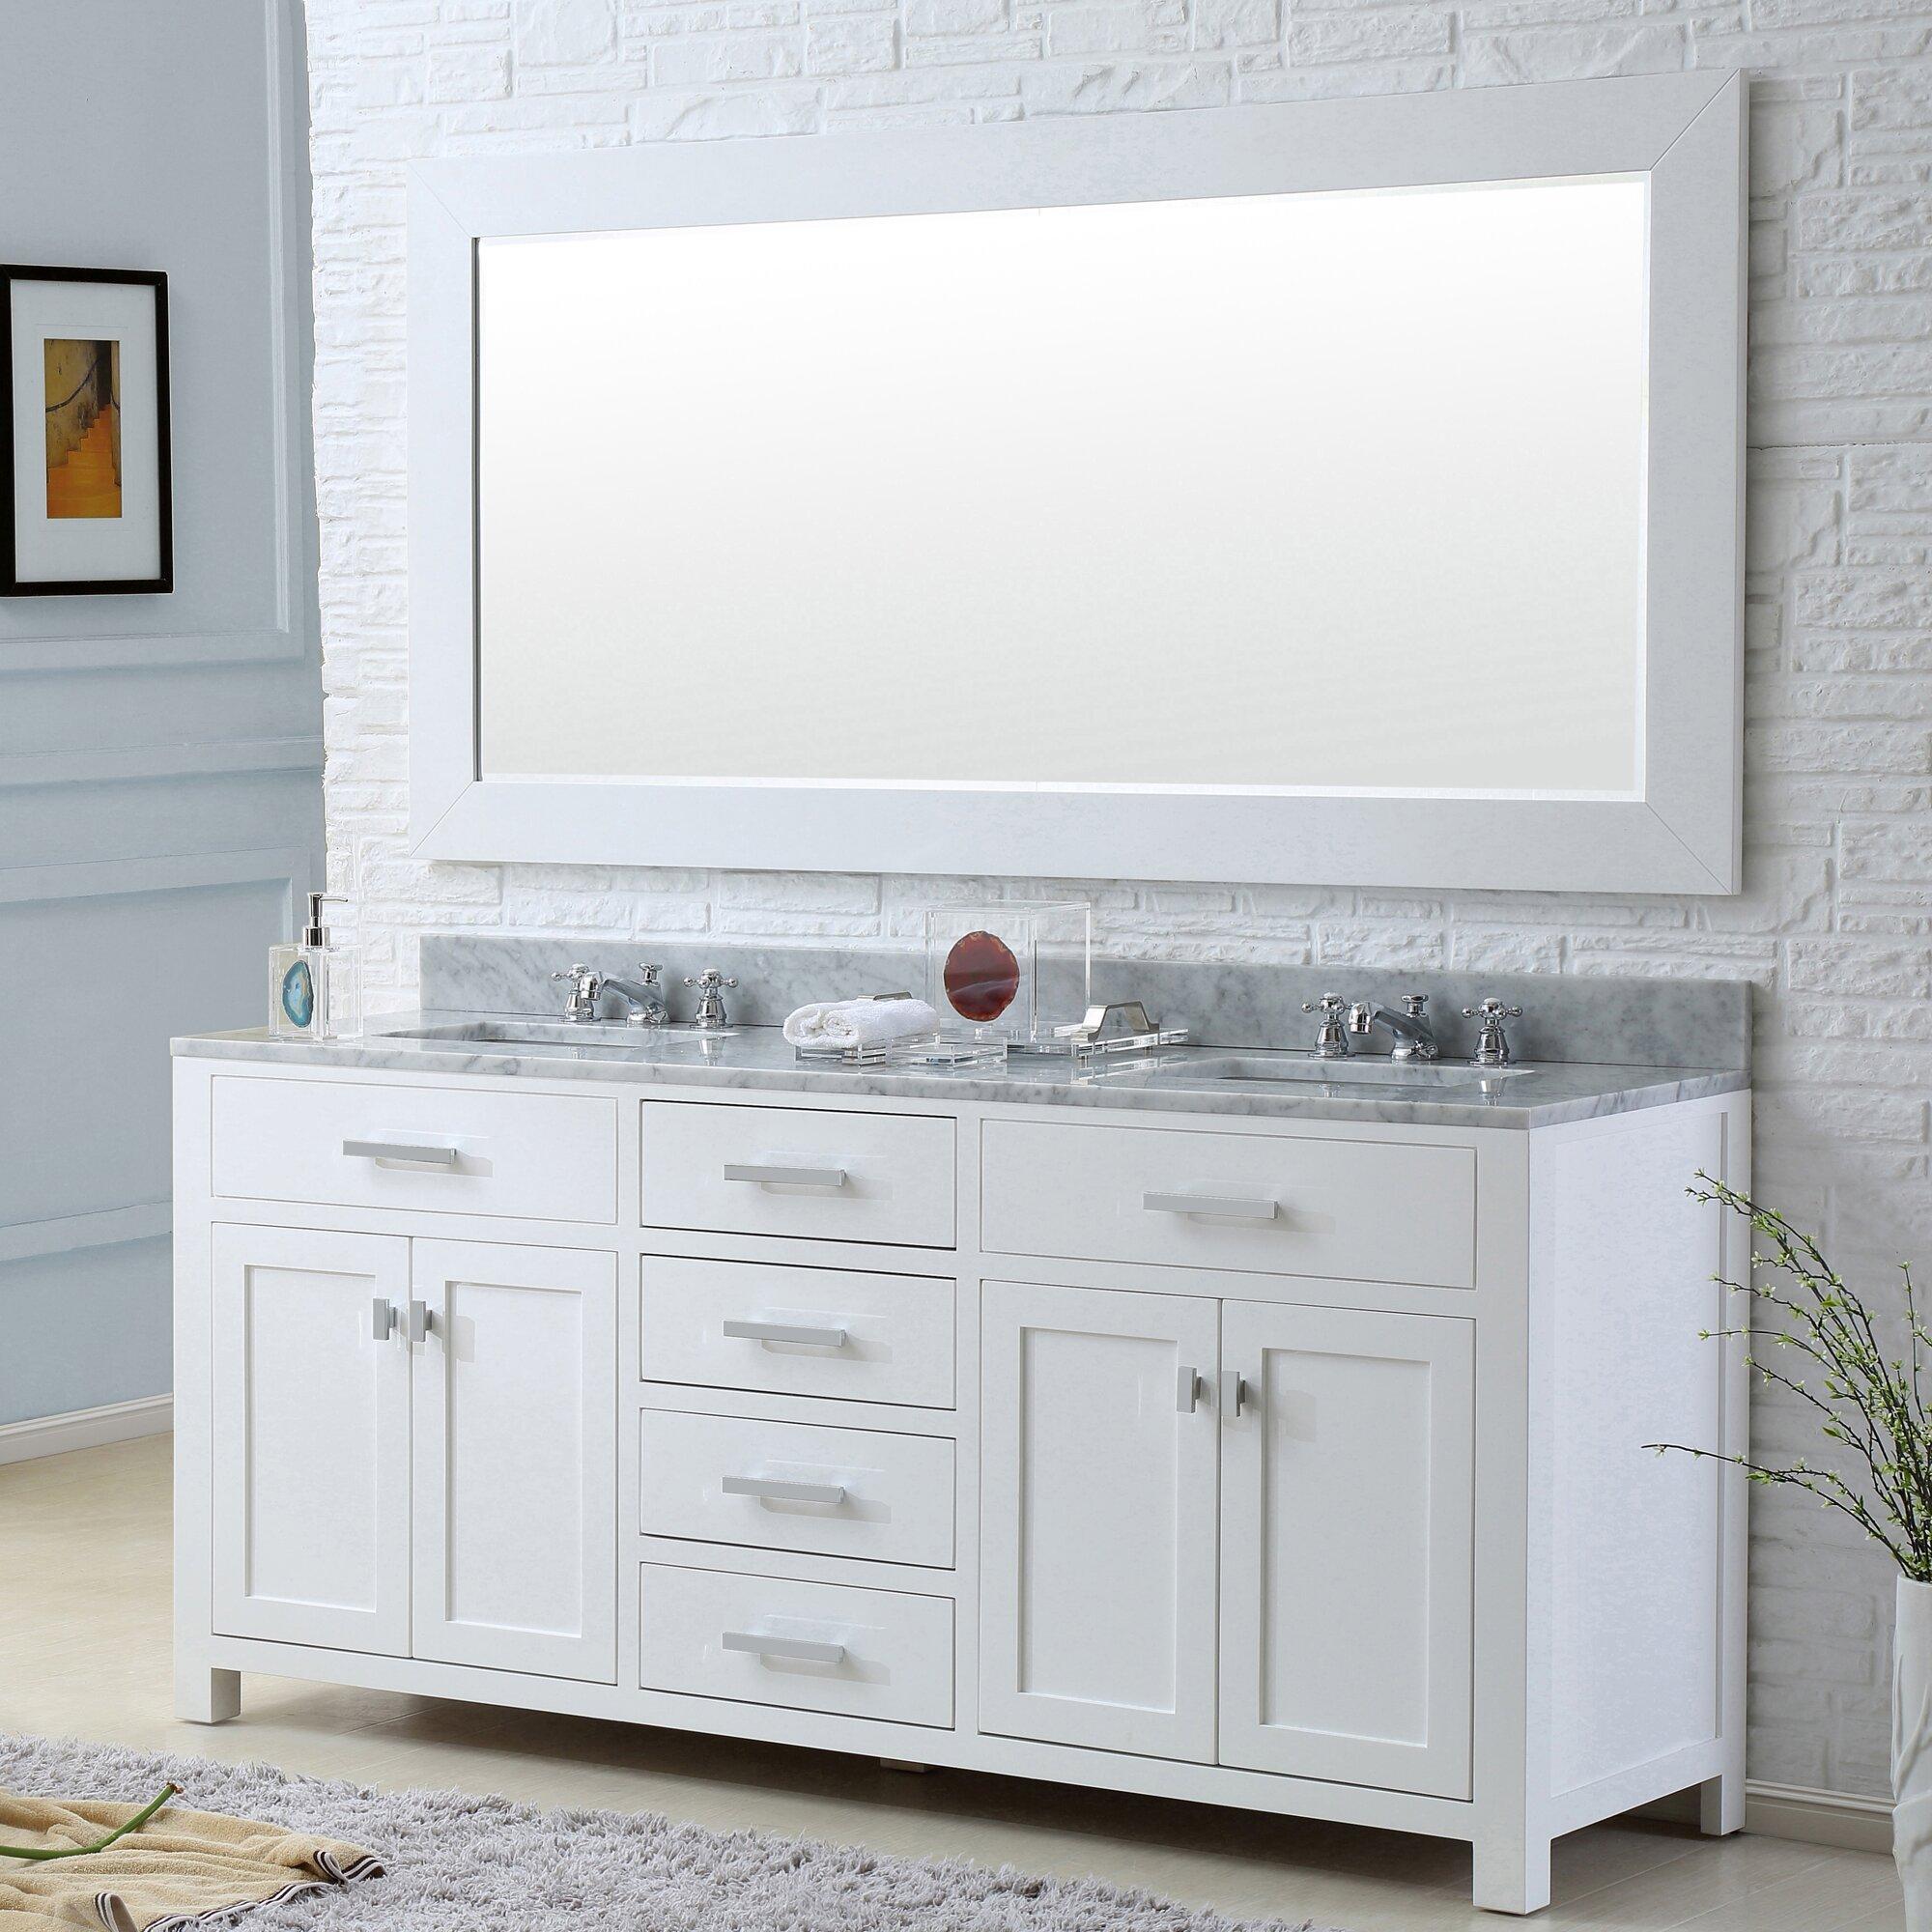 Dcor design creighton 60 double bathroom vanity set with for Bathroom mirror set